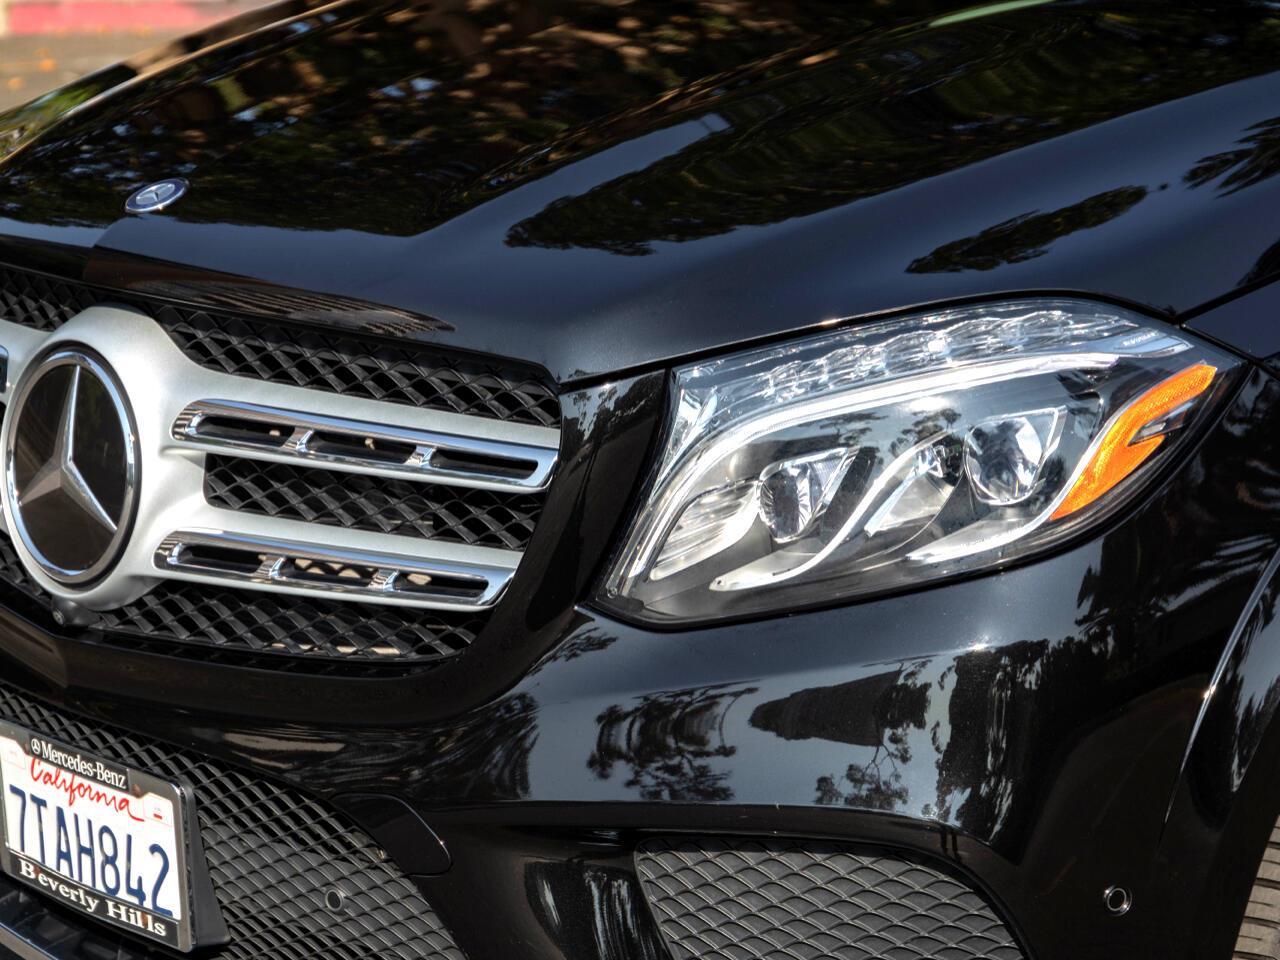 2017 Mercedes-Benz GLS-Class (CC-1388353) for sale in Marina Del Rey, California